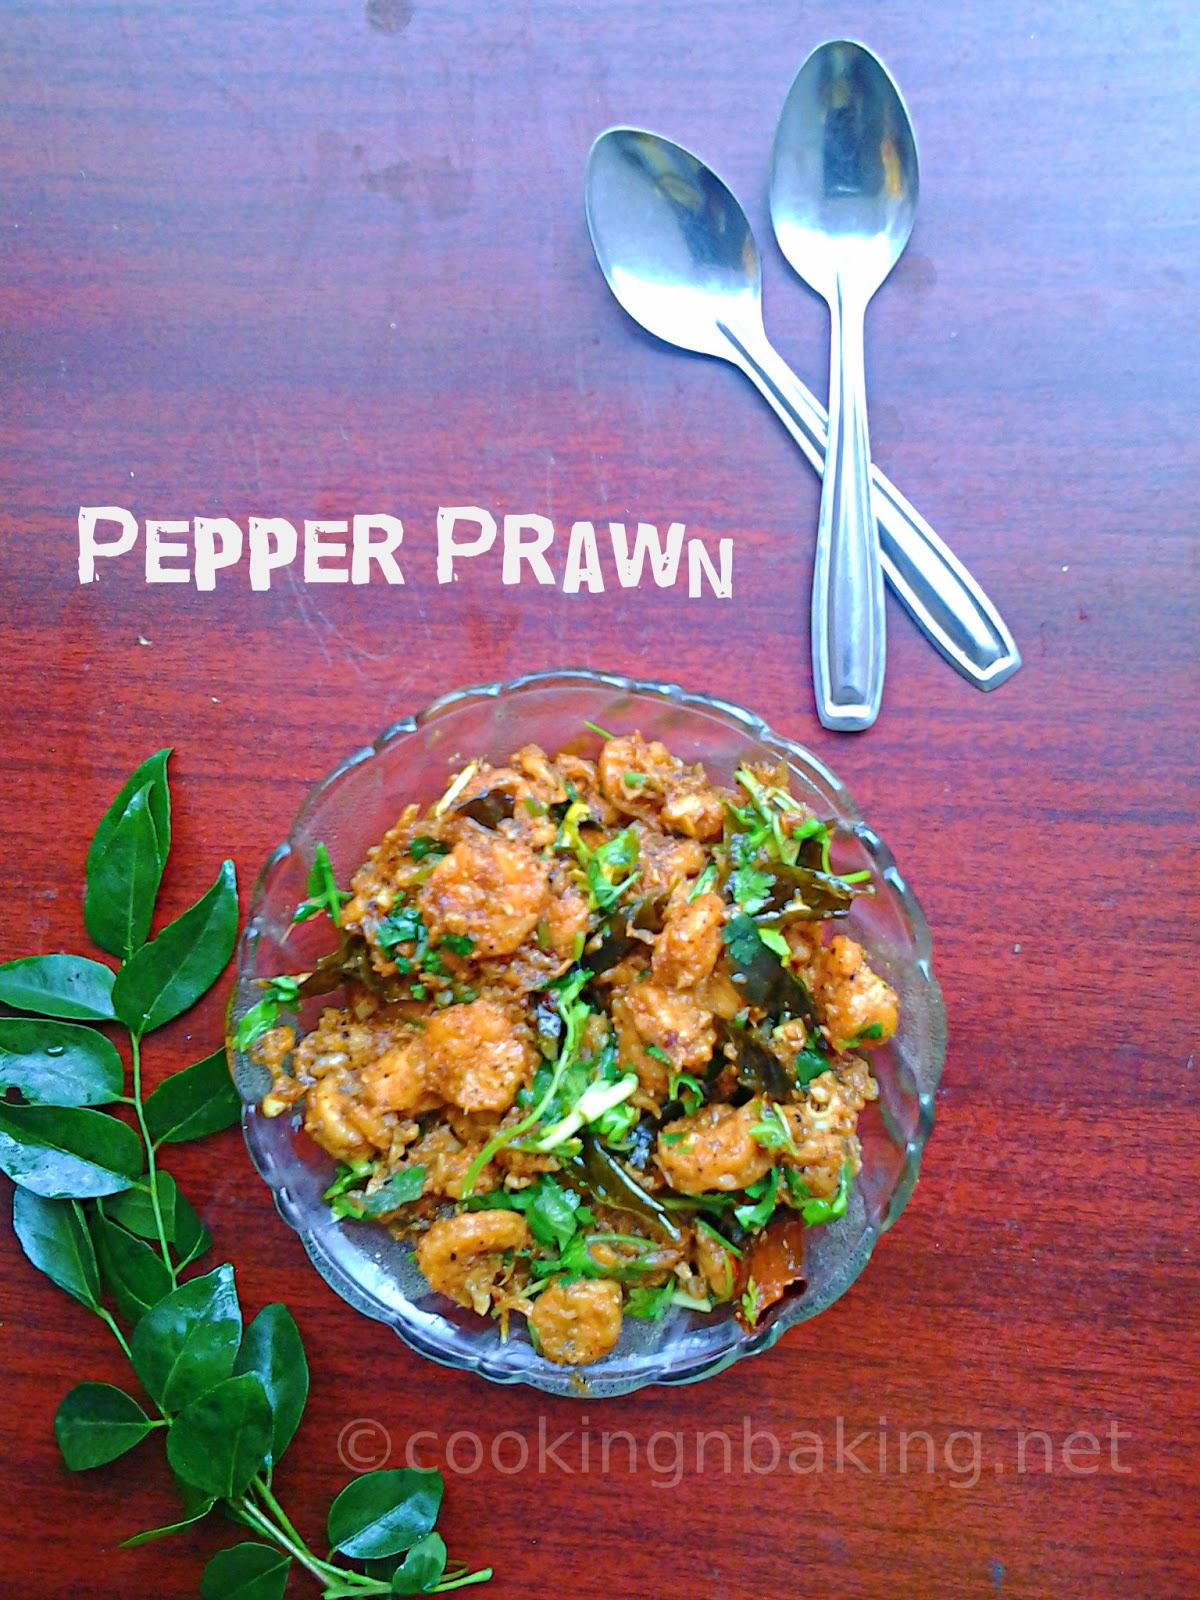 Pepper Prawn | How to make Pepper Prawn